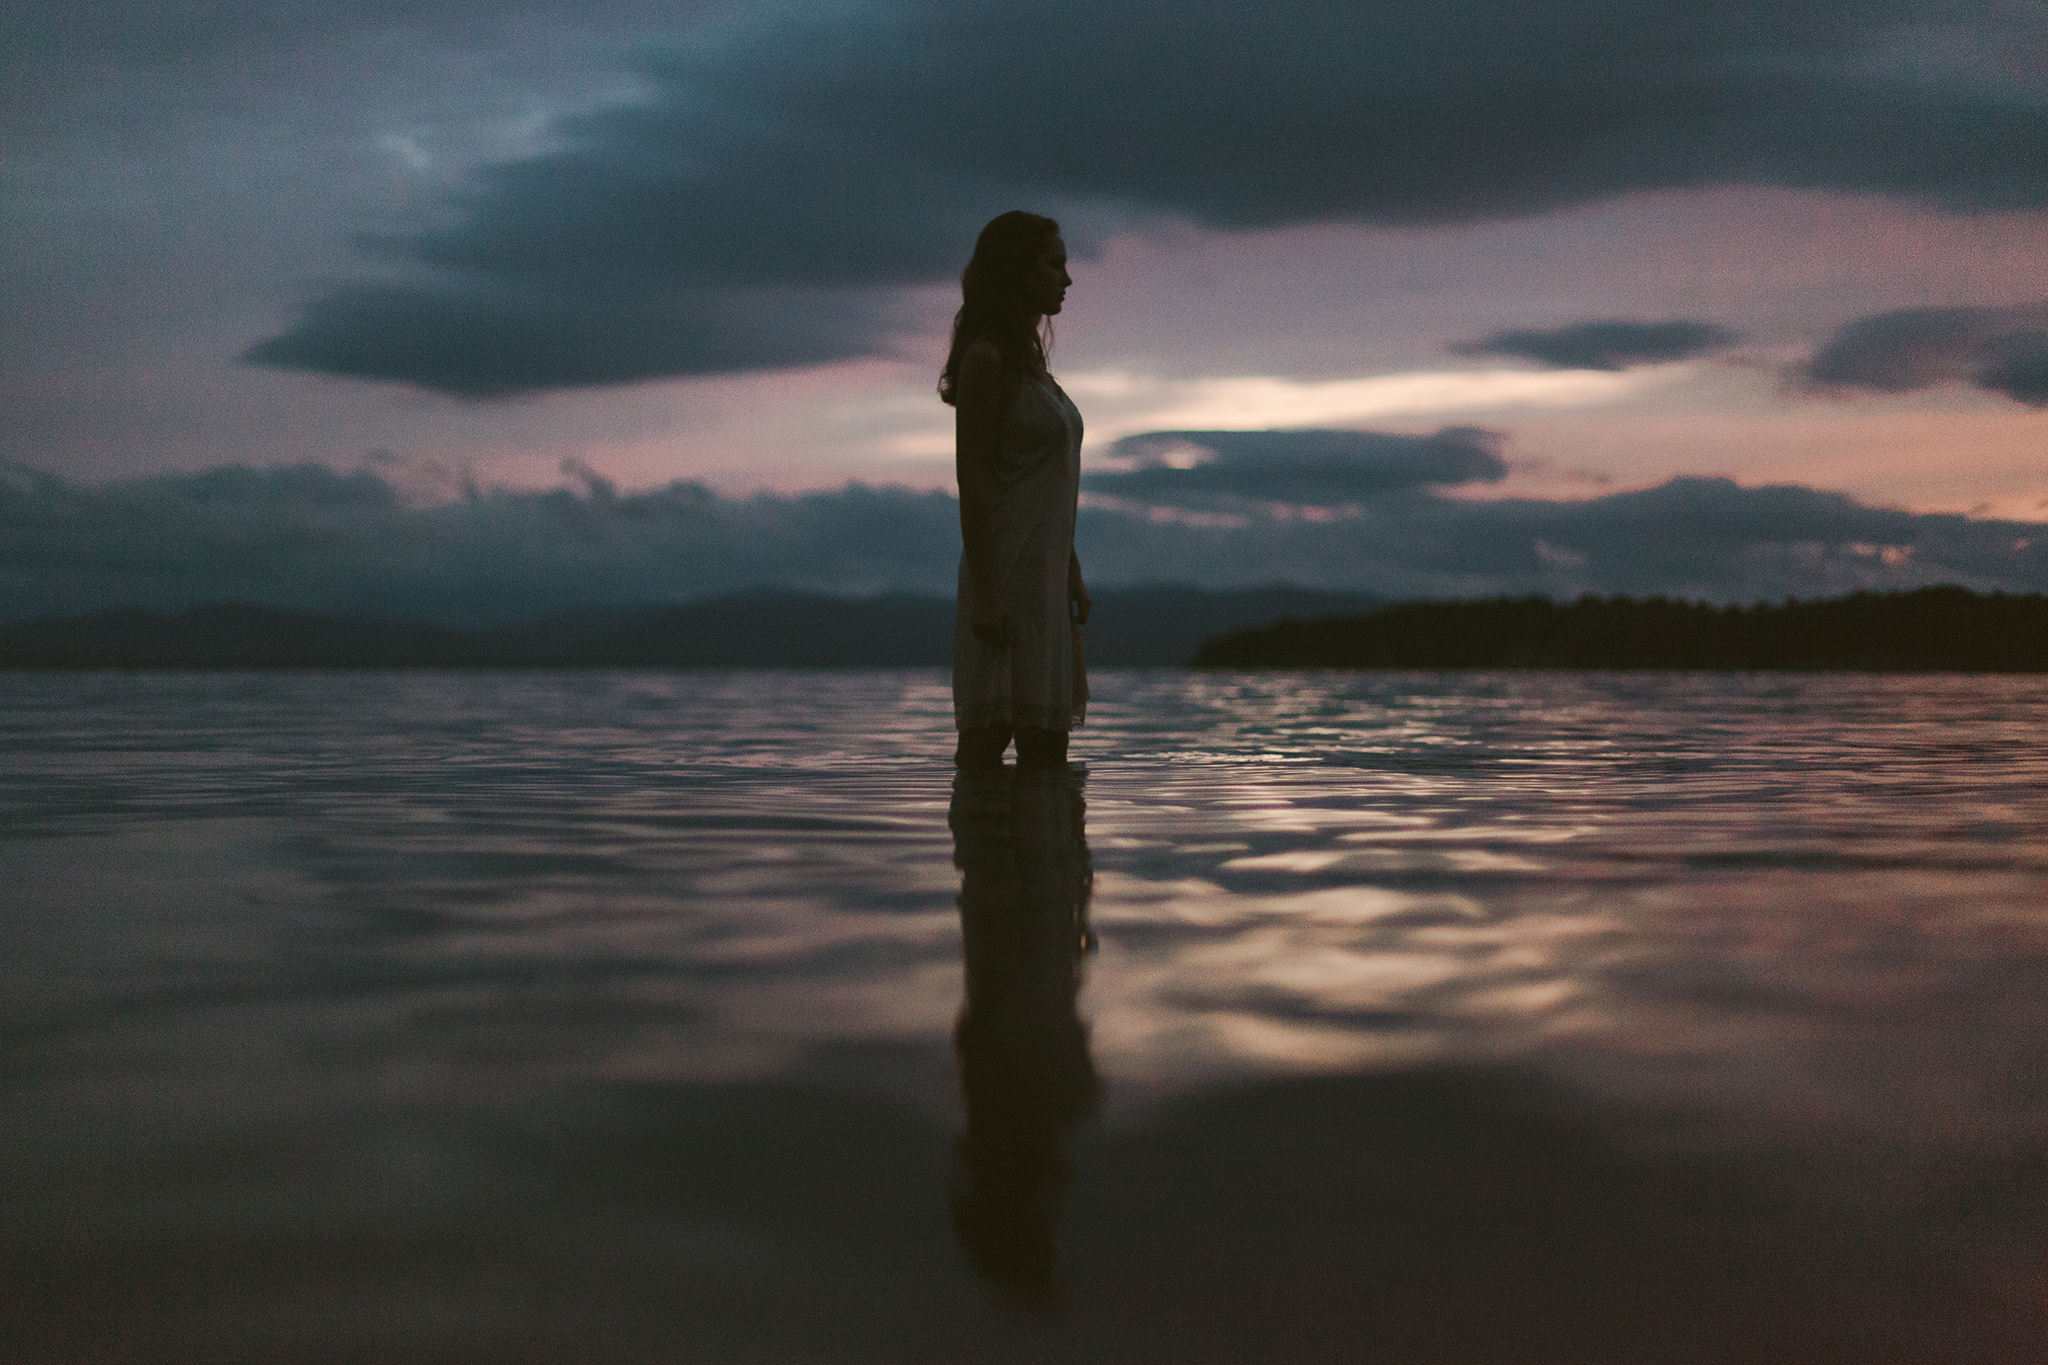 burlington_vermont_photographer_sunset_beach018.JPG